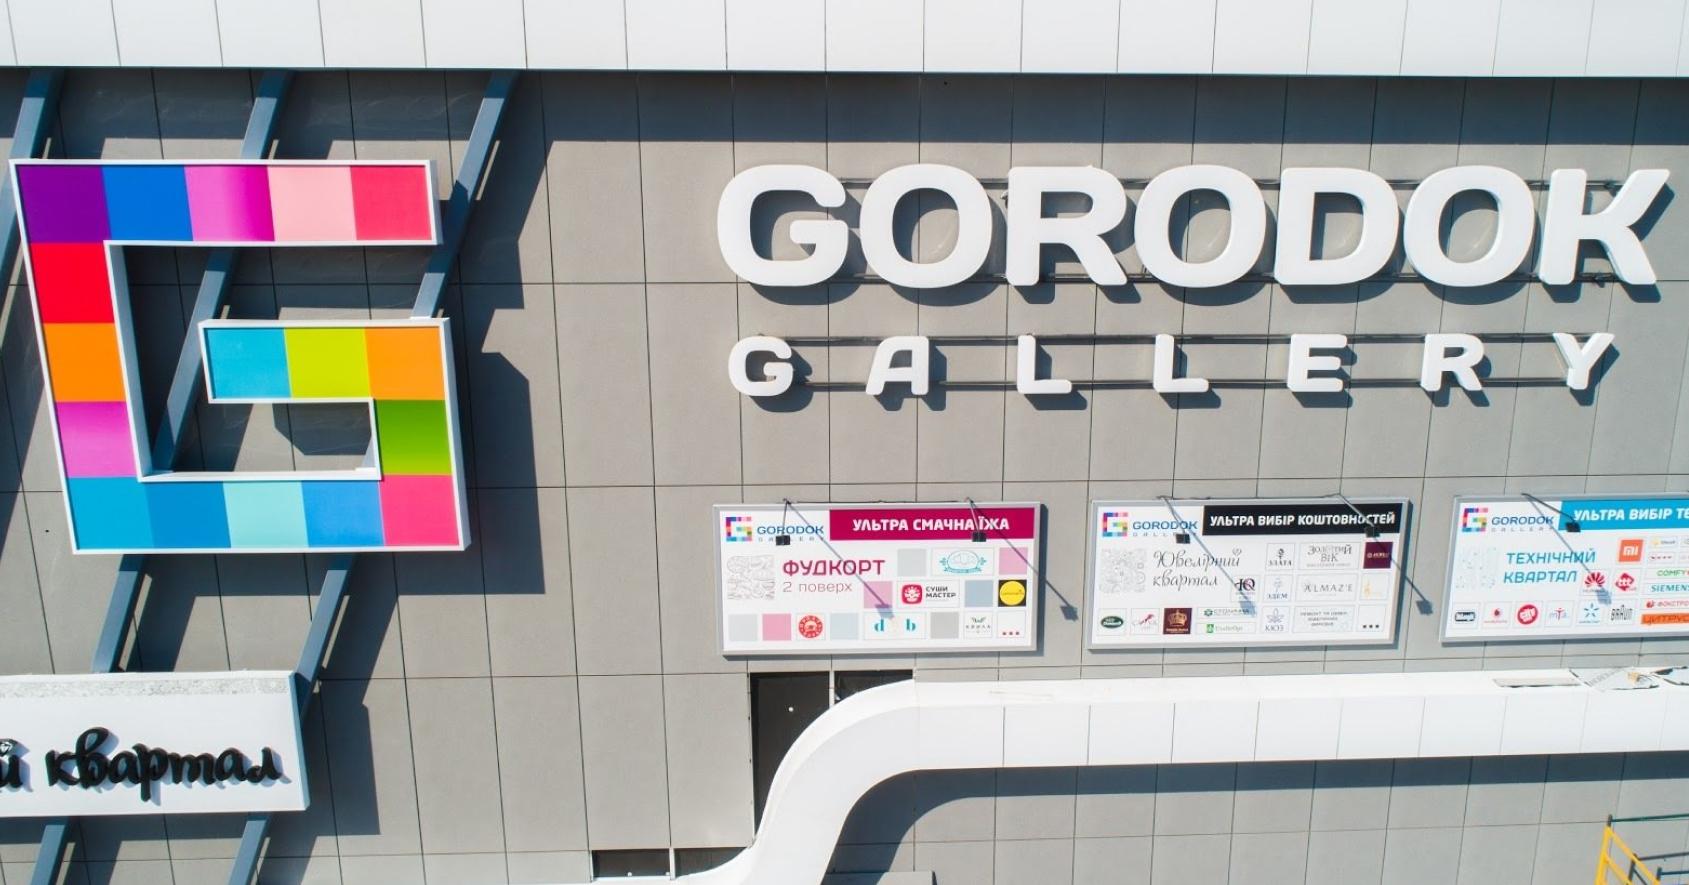 Gorodok Gallery